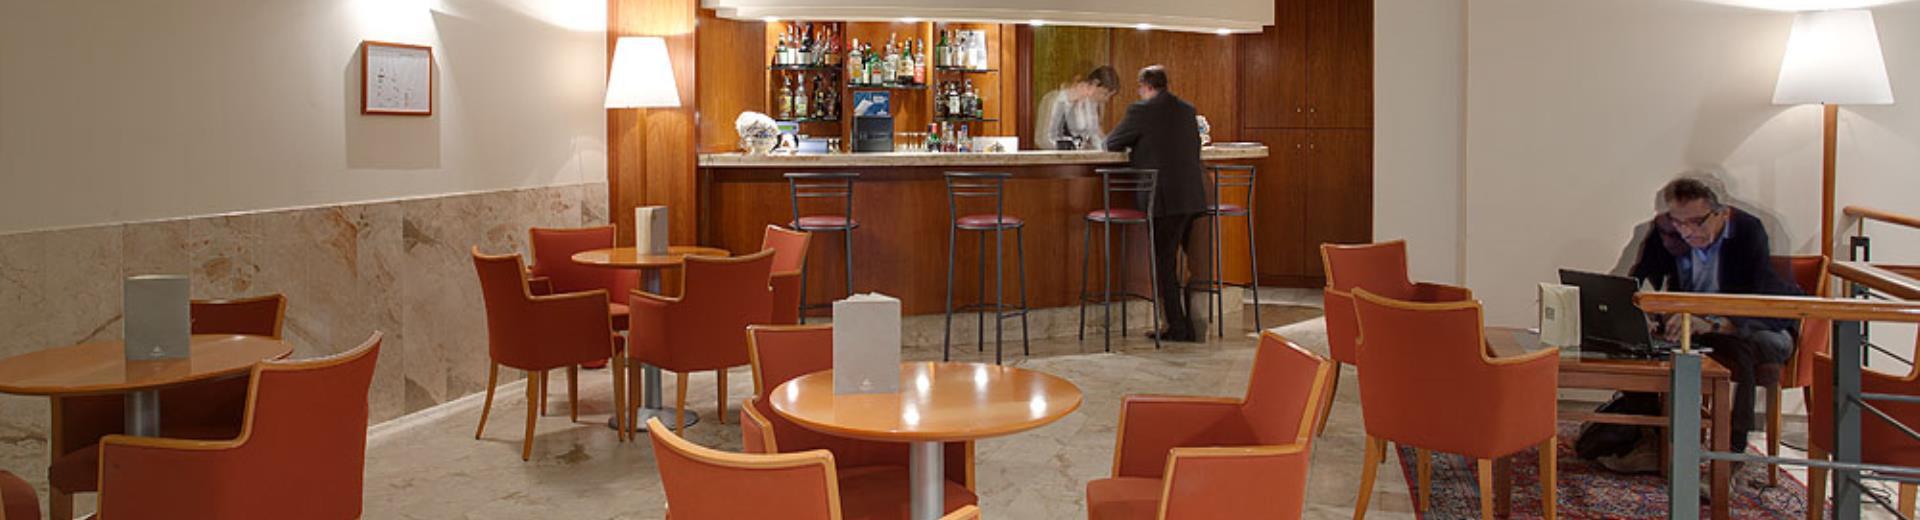 Home Le Foyer La Sagne : Best western park hotel plasencia